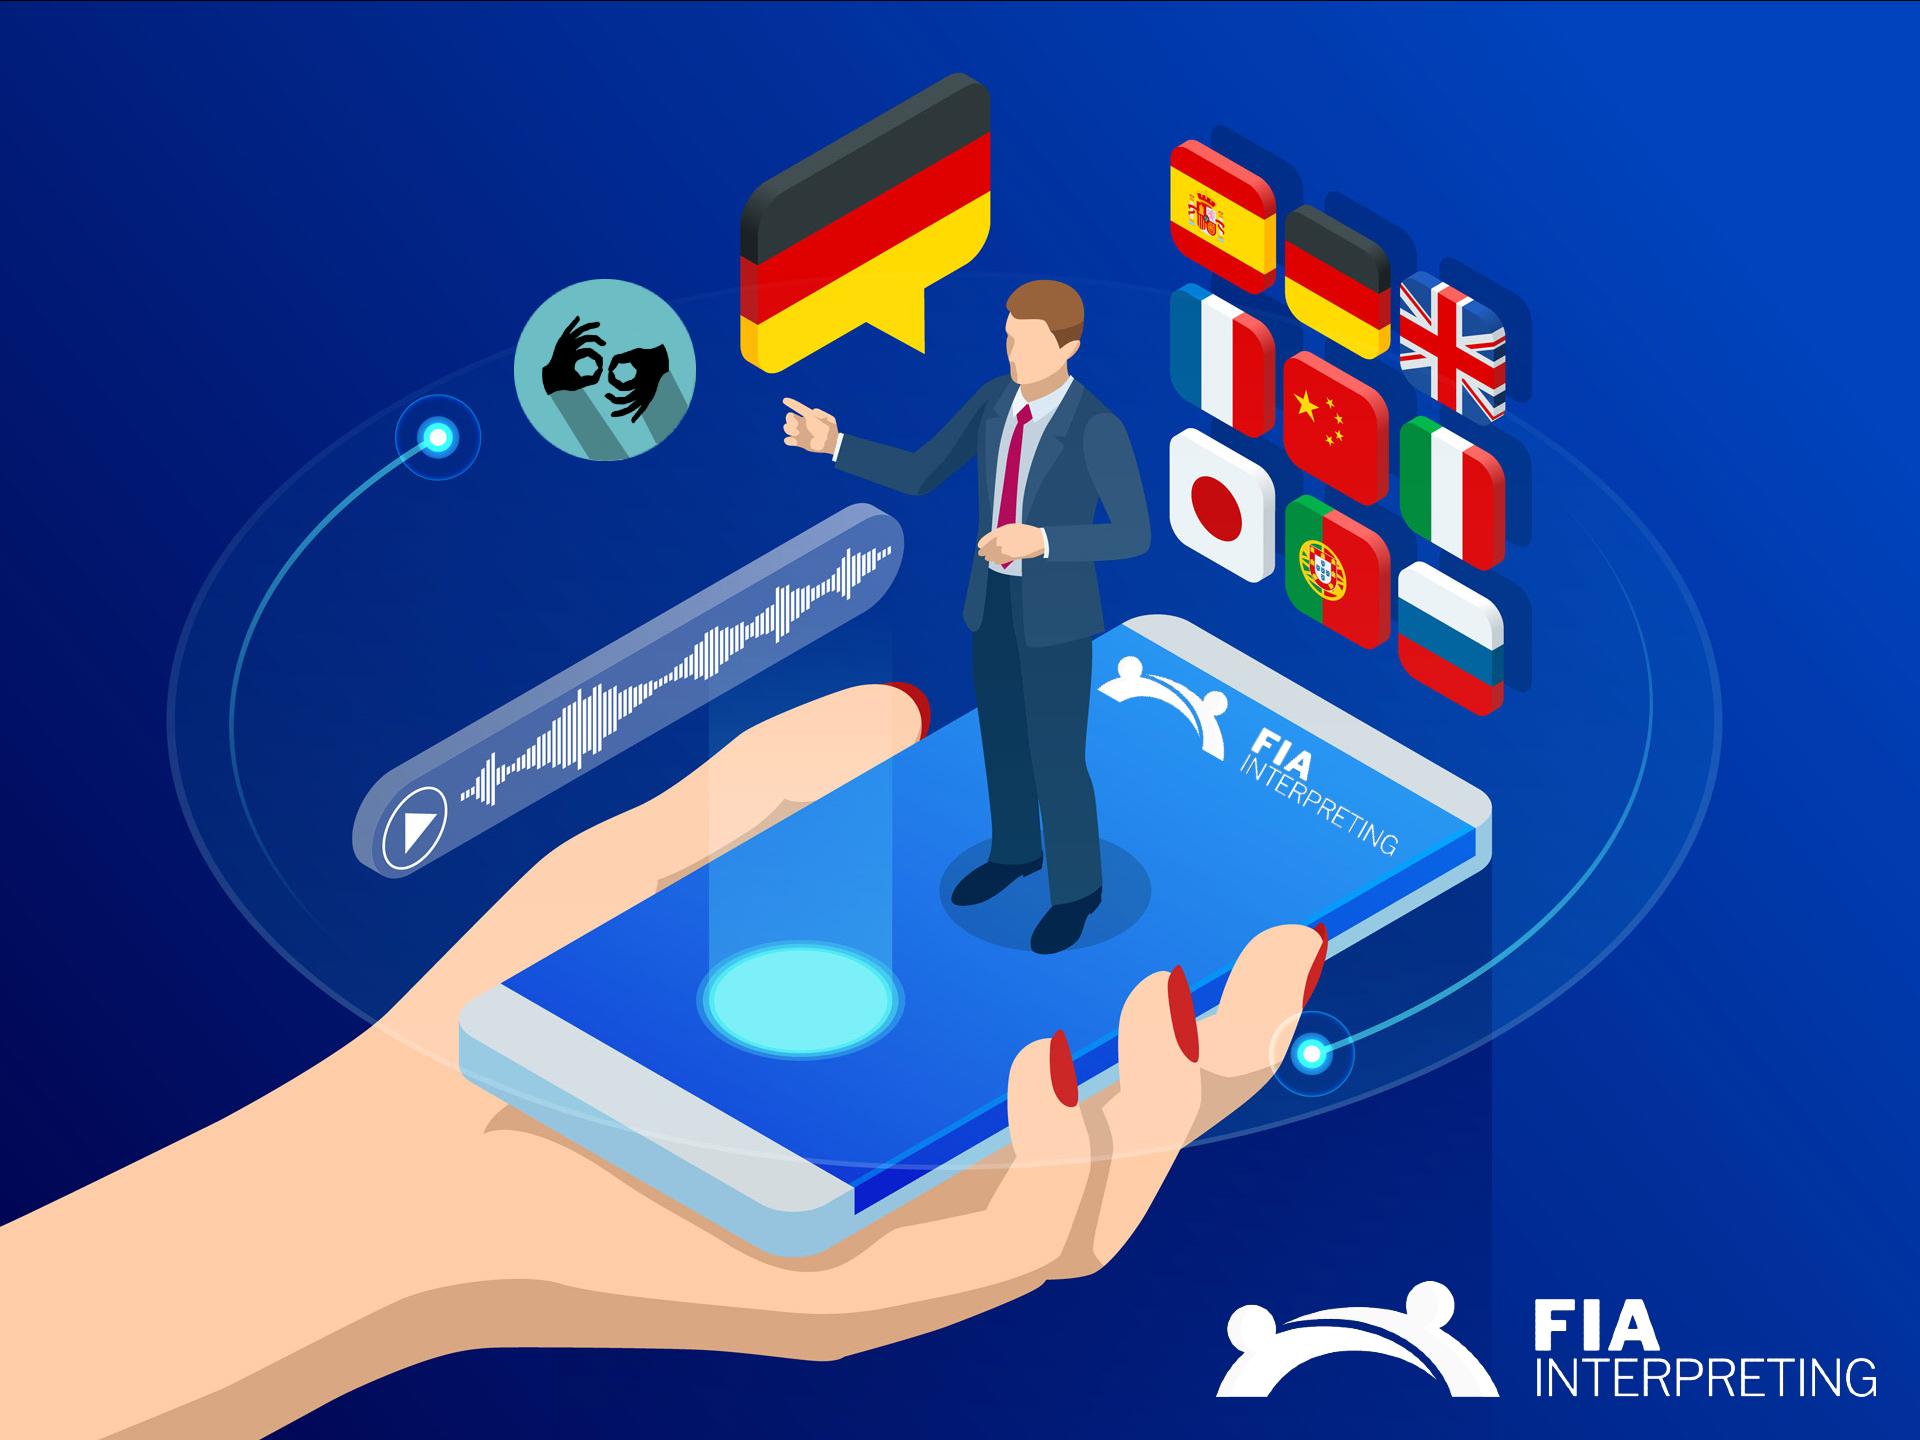 FIA Interpreting VRI